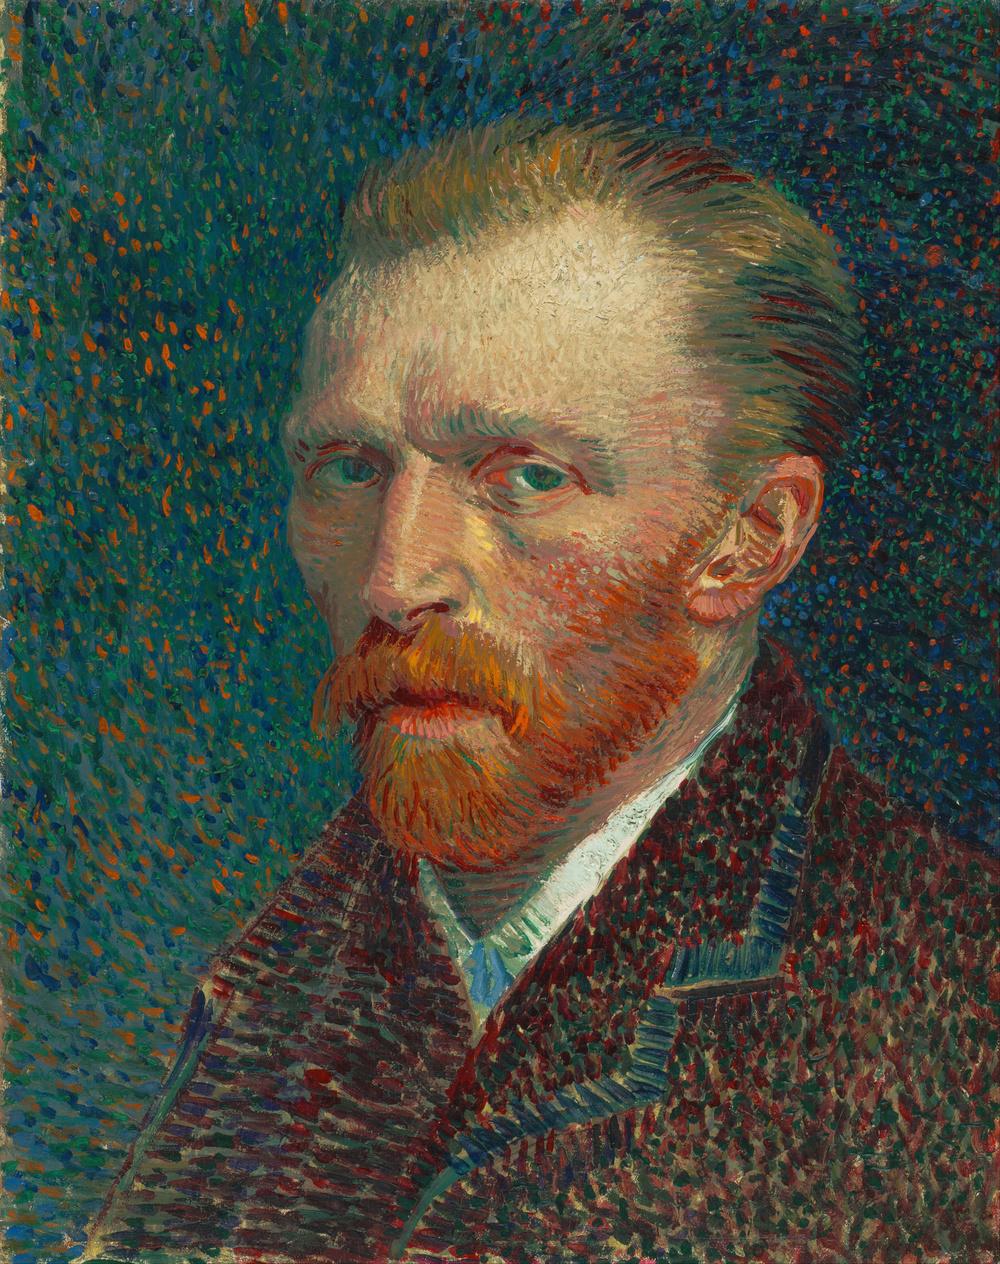 Self-portrait, Spring 1887, Vincent van Gogh